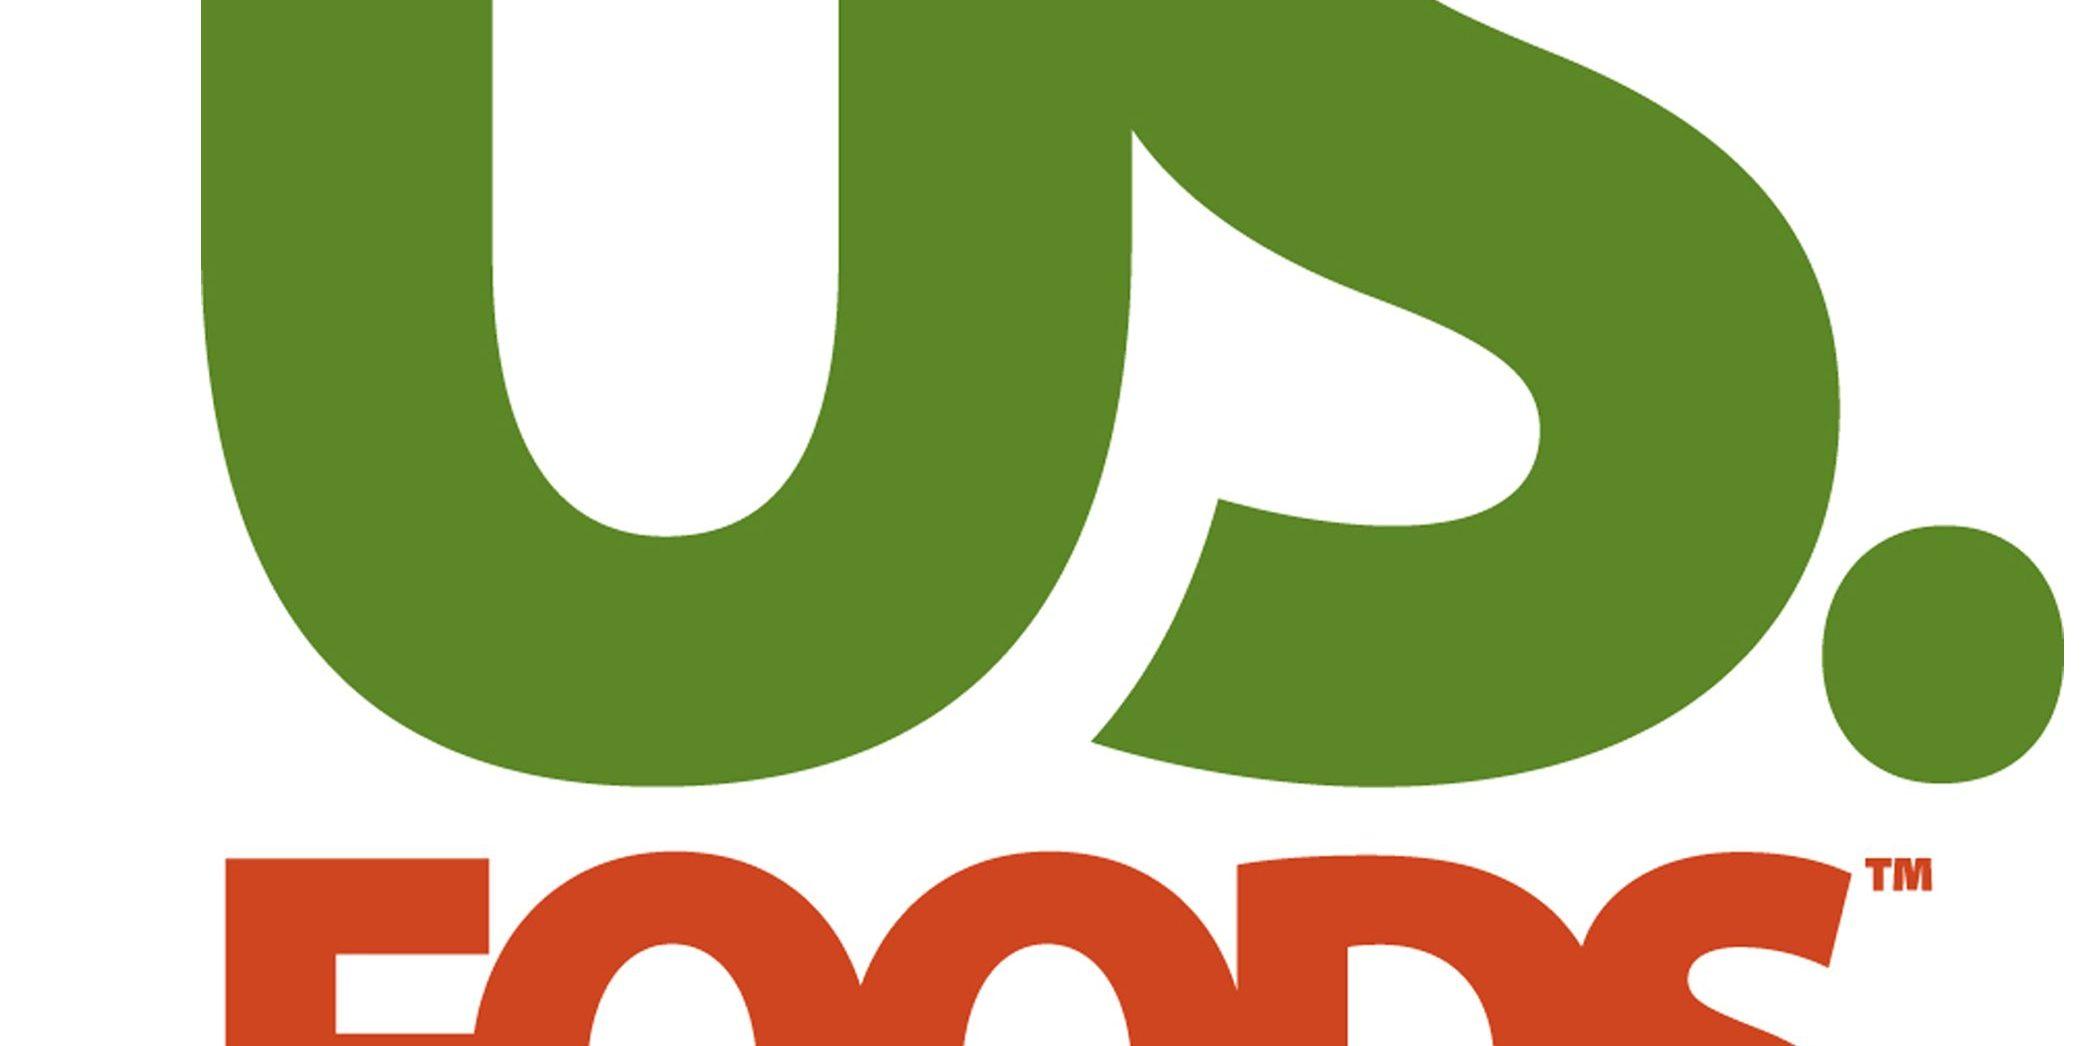 Us foods Logos.